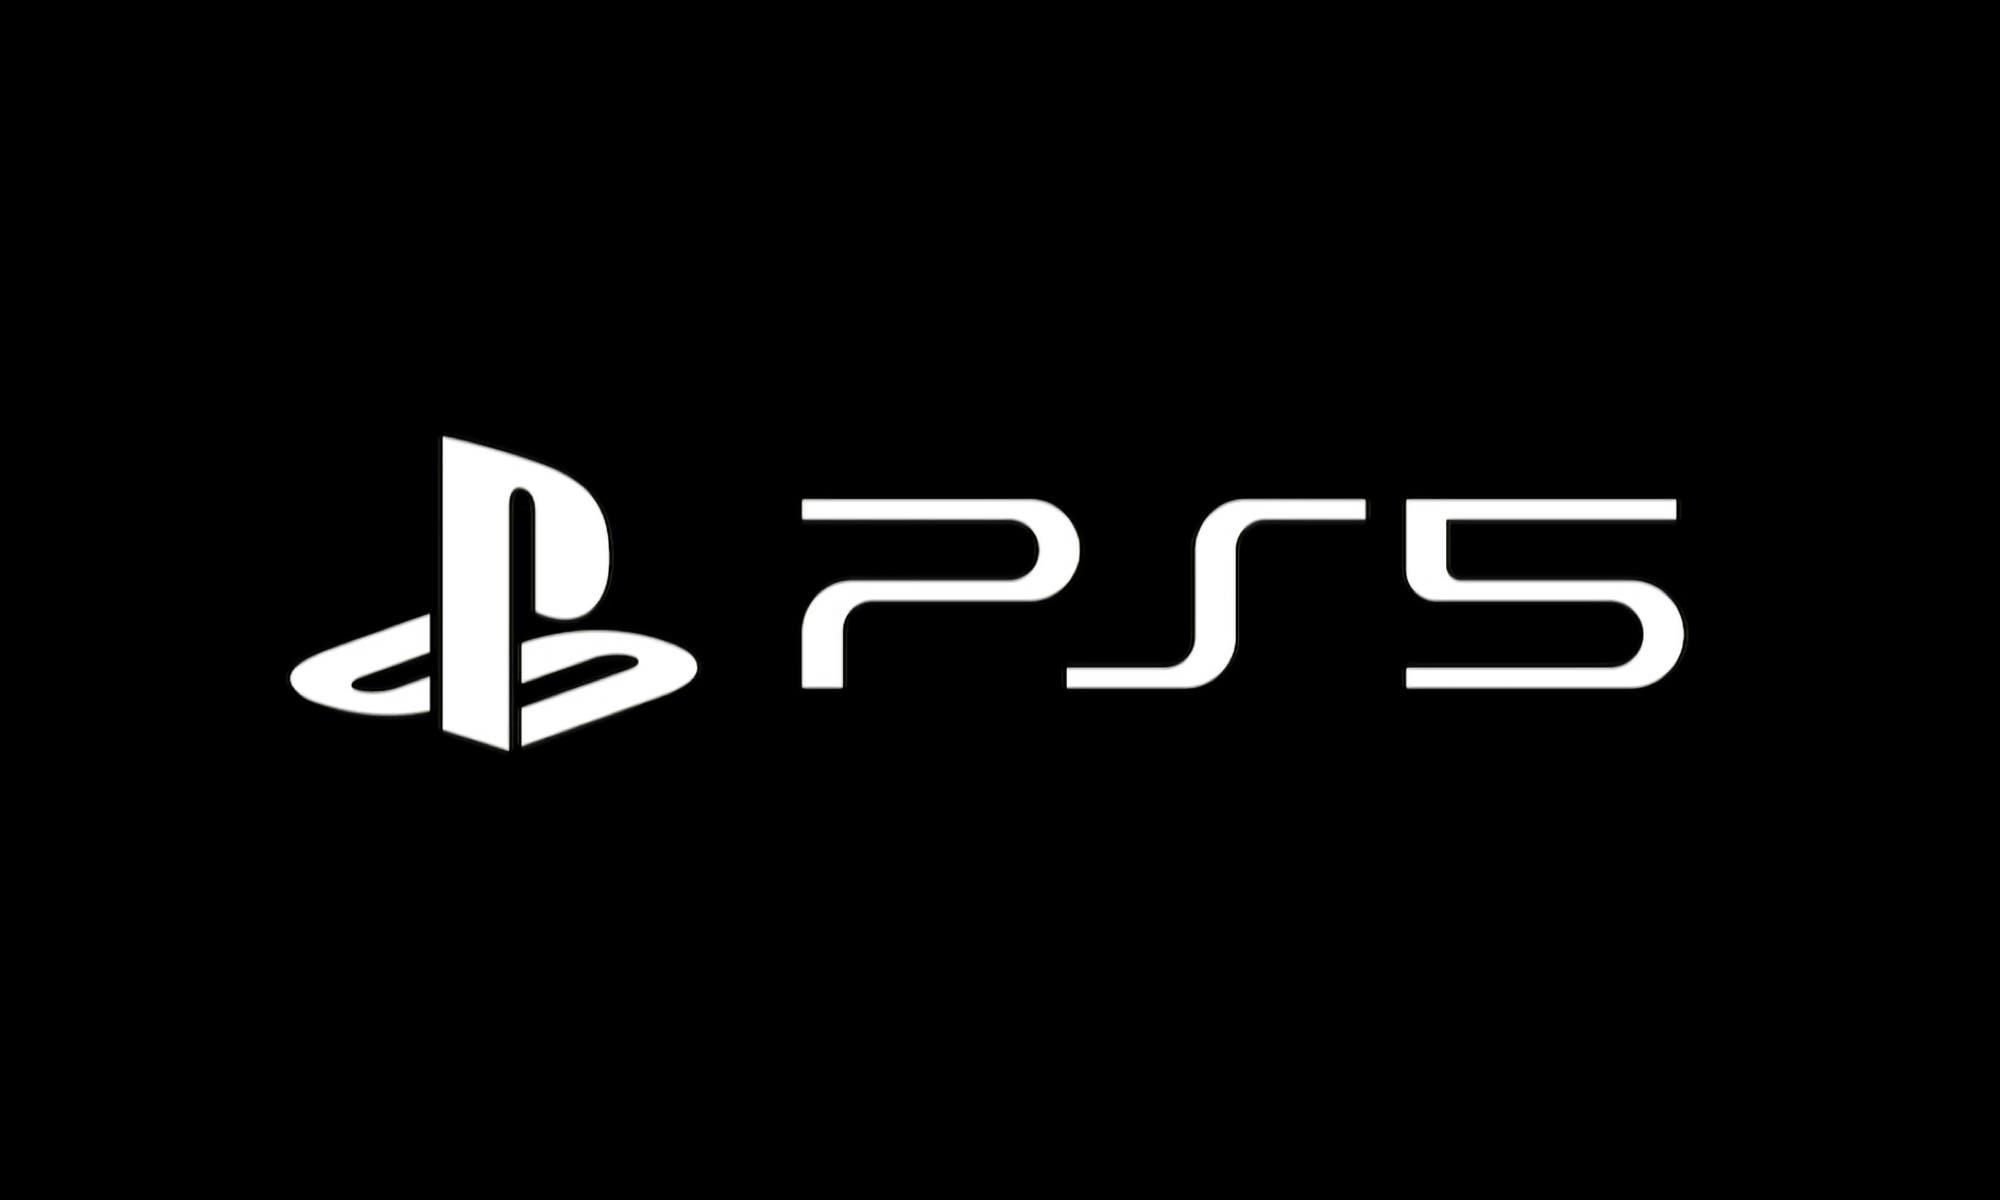 Playstation 5 agotadas